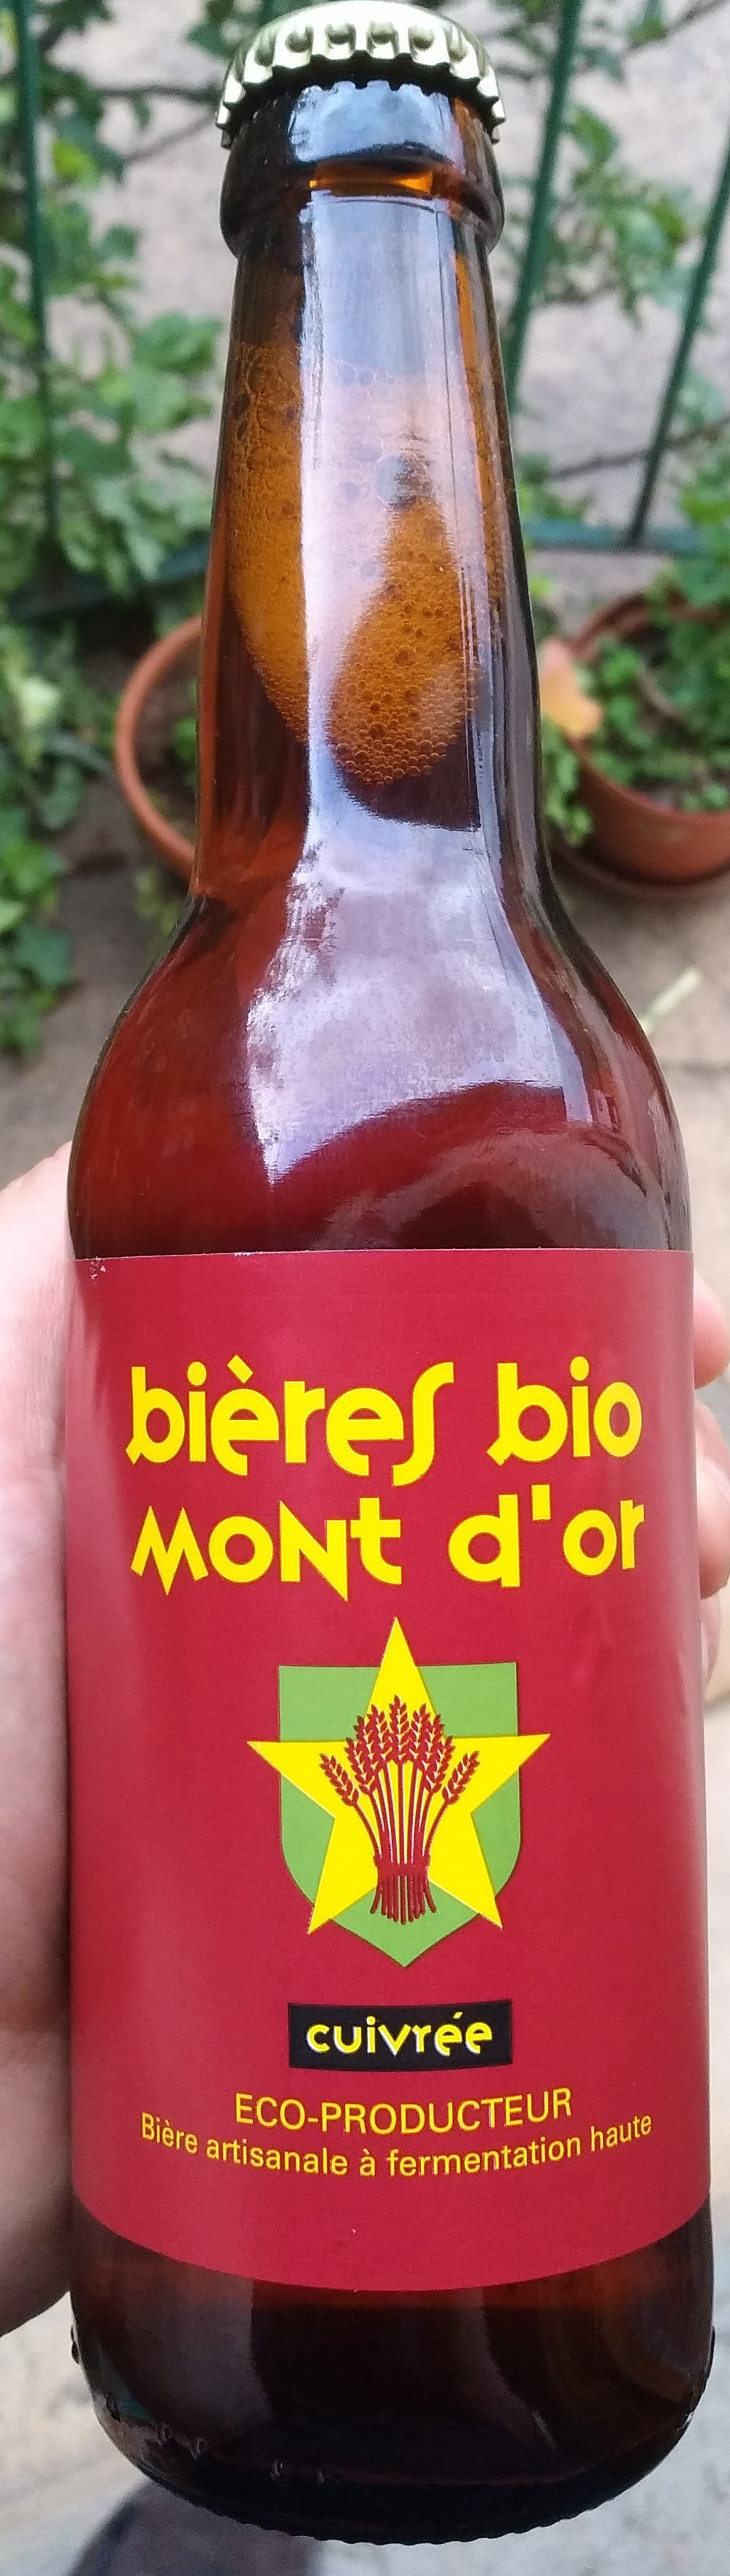 Biere mont d'or - Product - fr